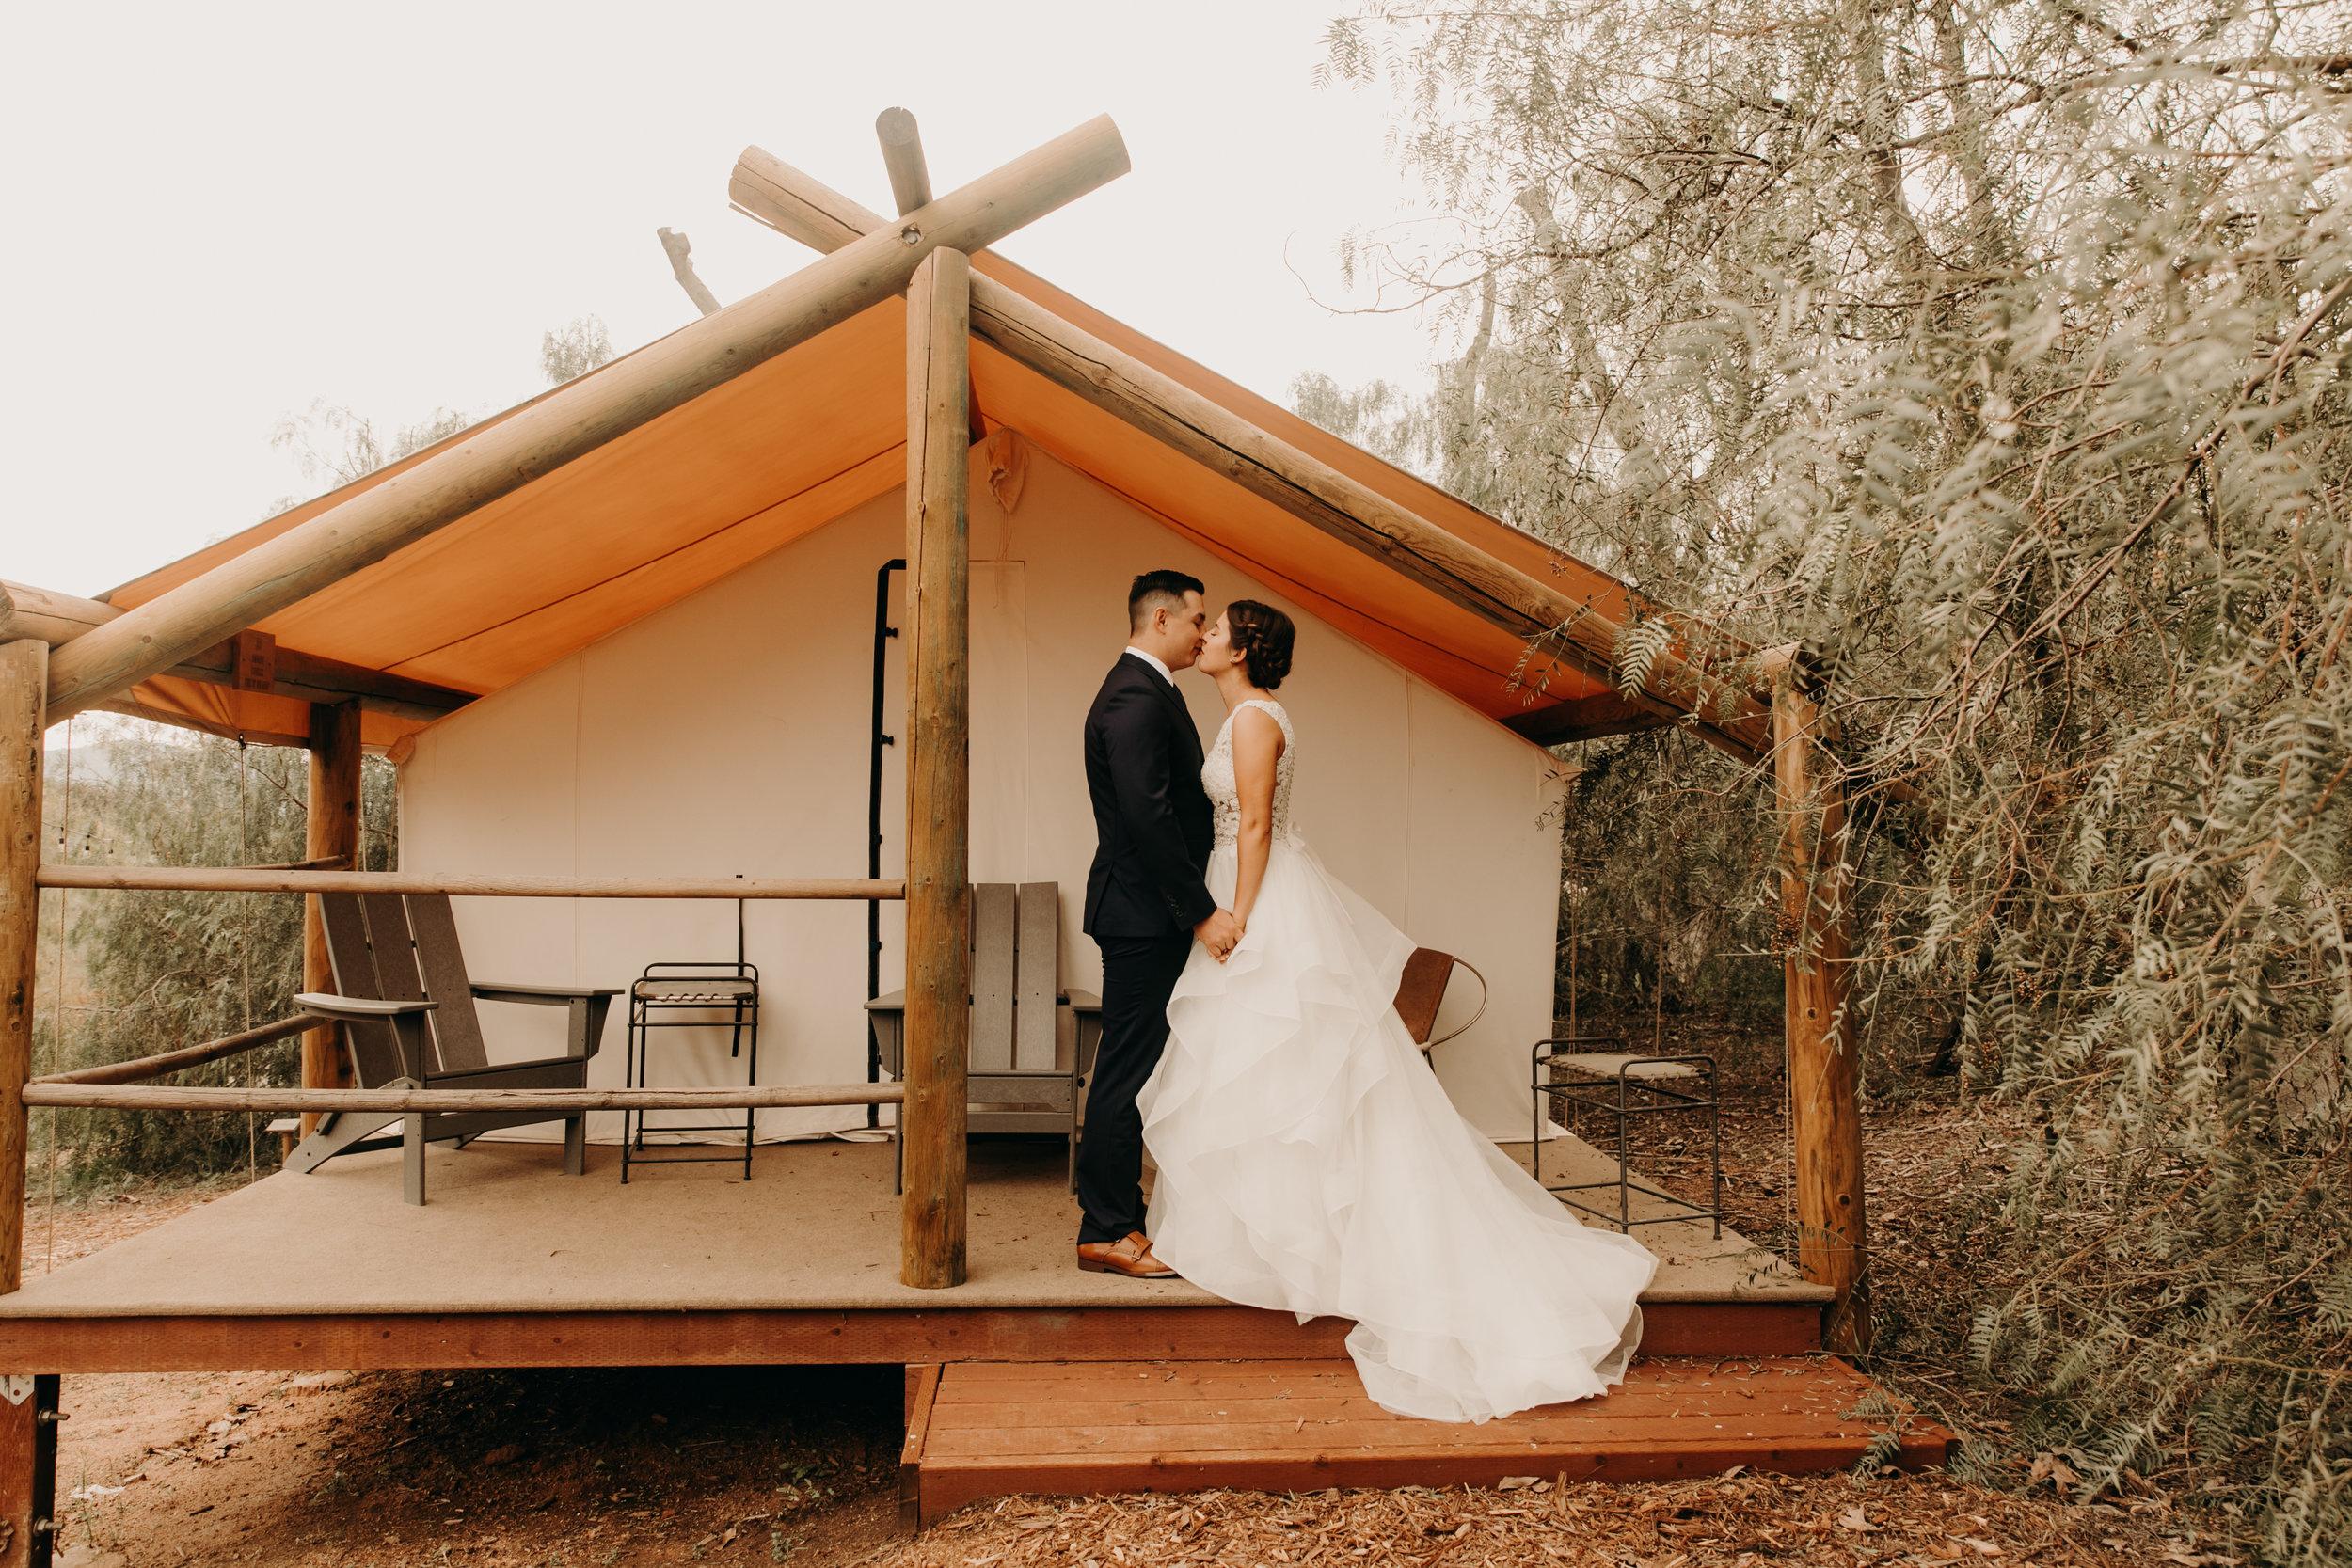 Beautiful San Diego wedding at Ethereal Open air Resort    Weddings